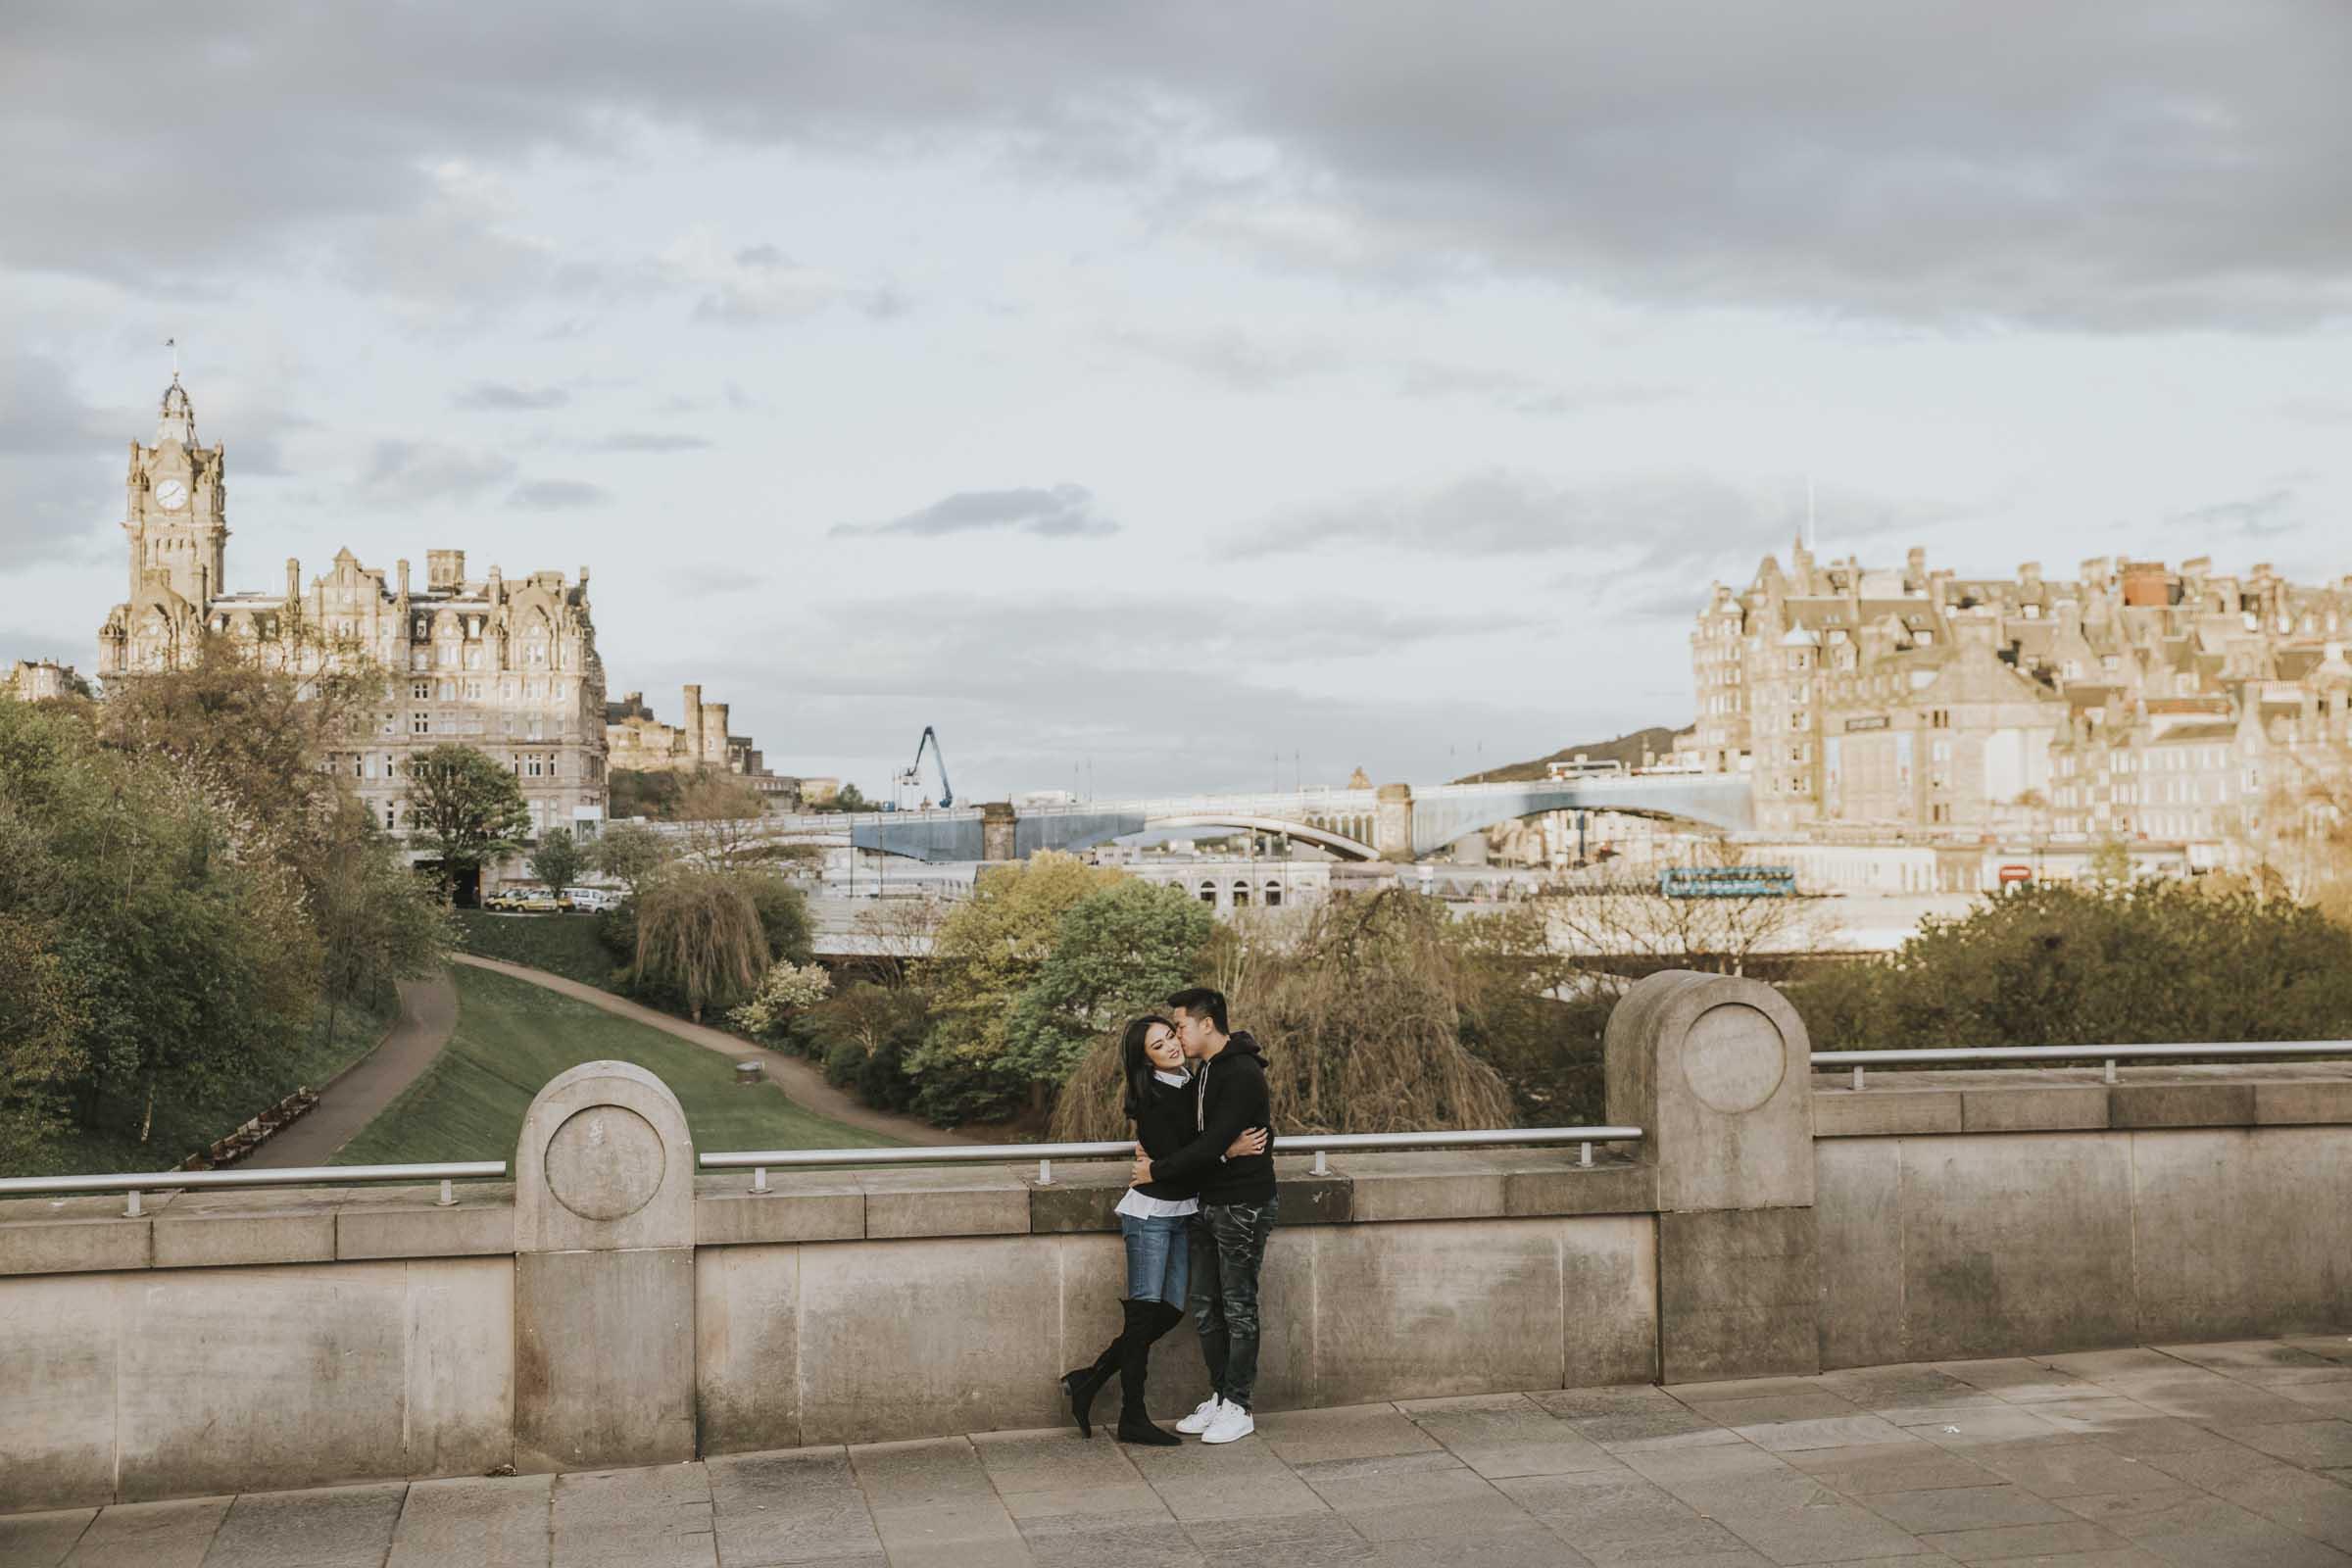 Couple Photoshoot   Suprise Wedding Proposal at Calton Hill   Edinburgh Engagement Photography by Ceranna   Scottish Fine Art Wedding Photographer